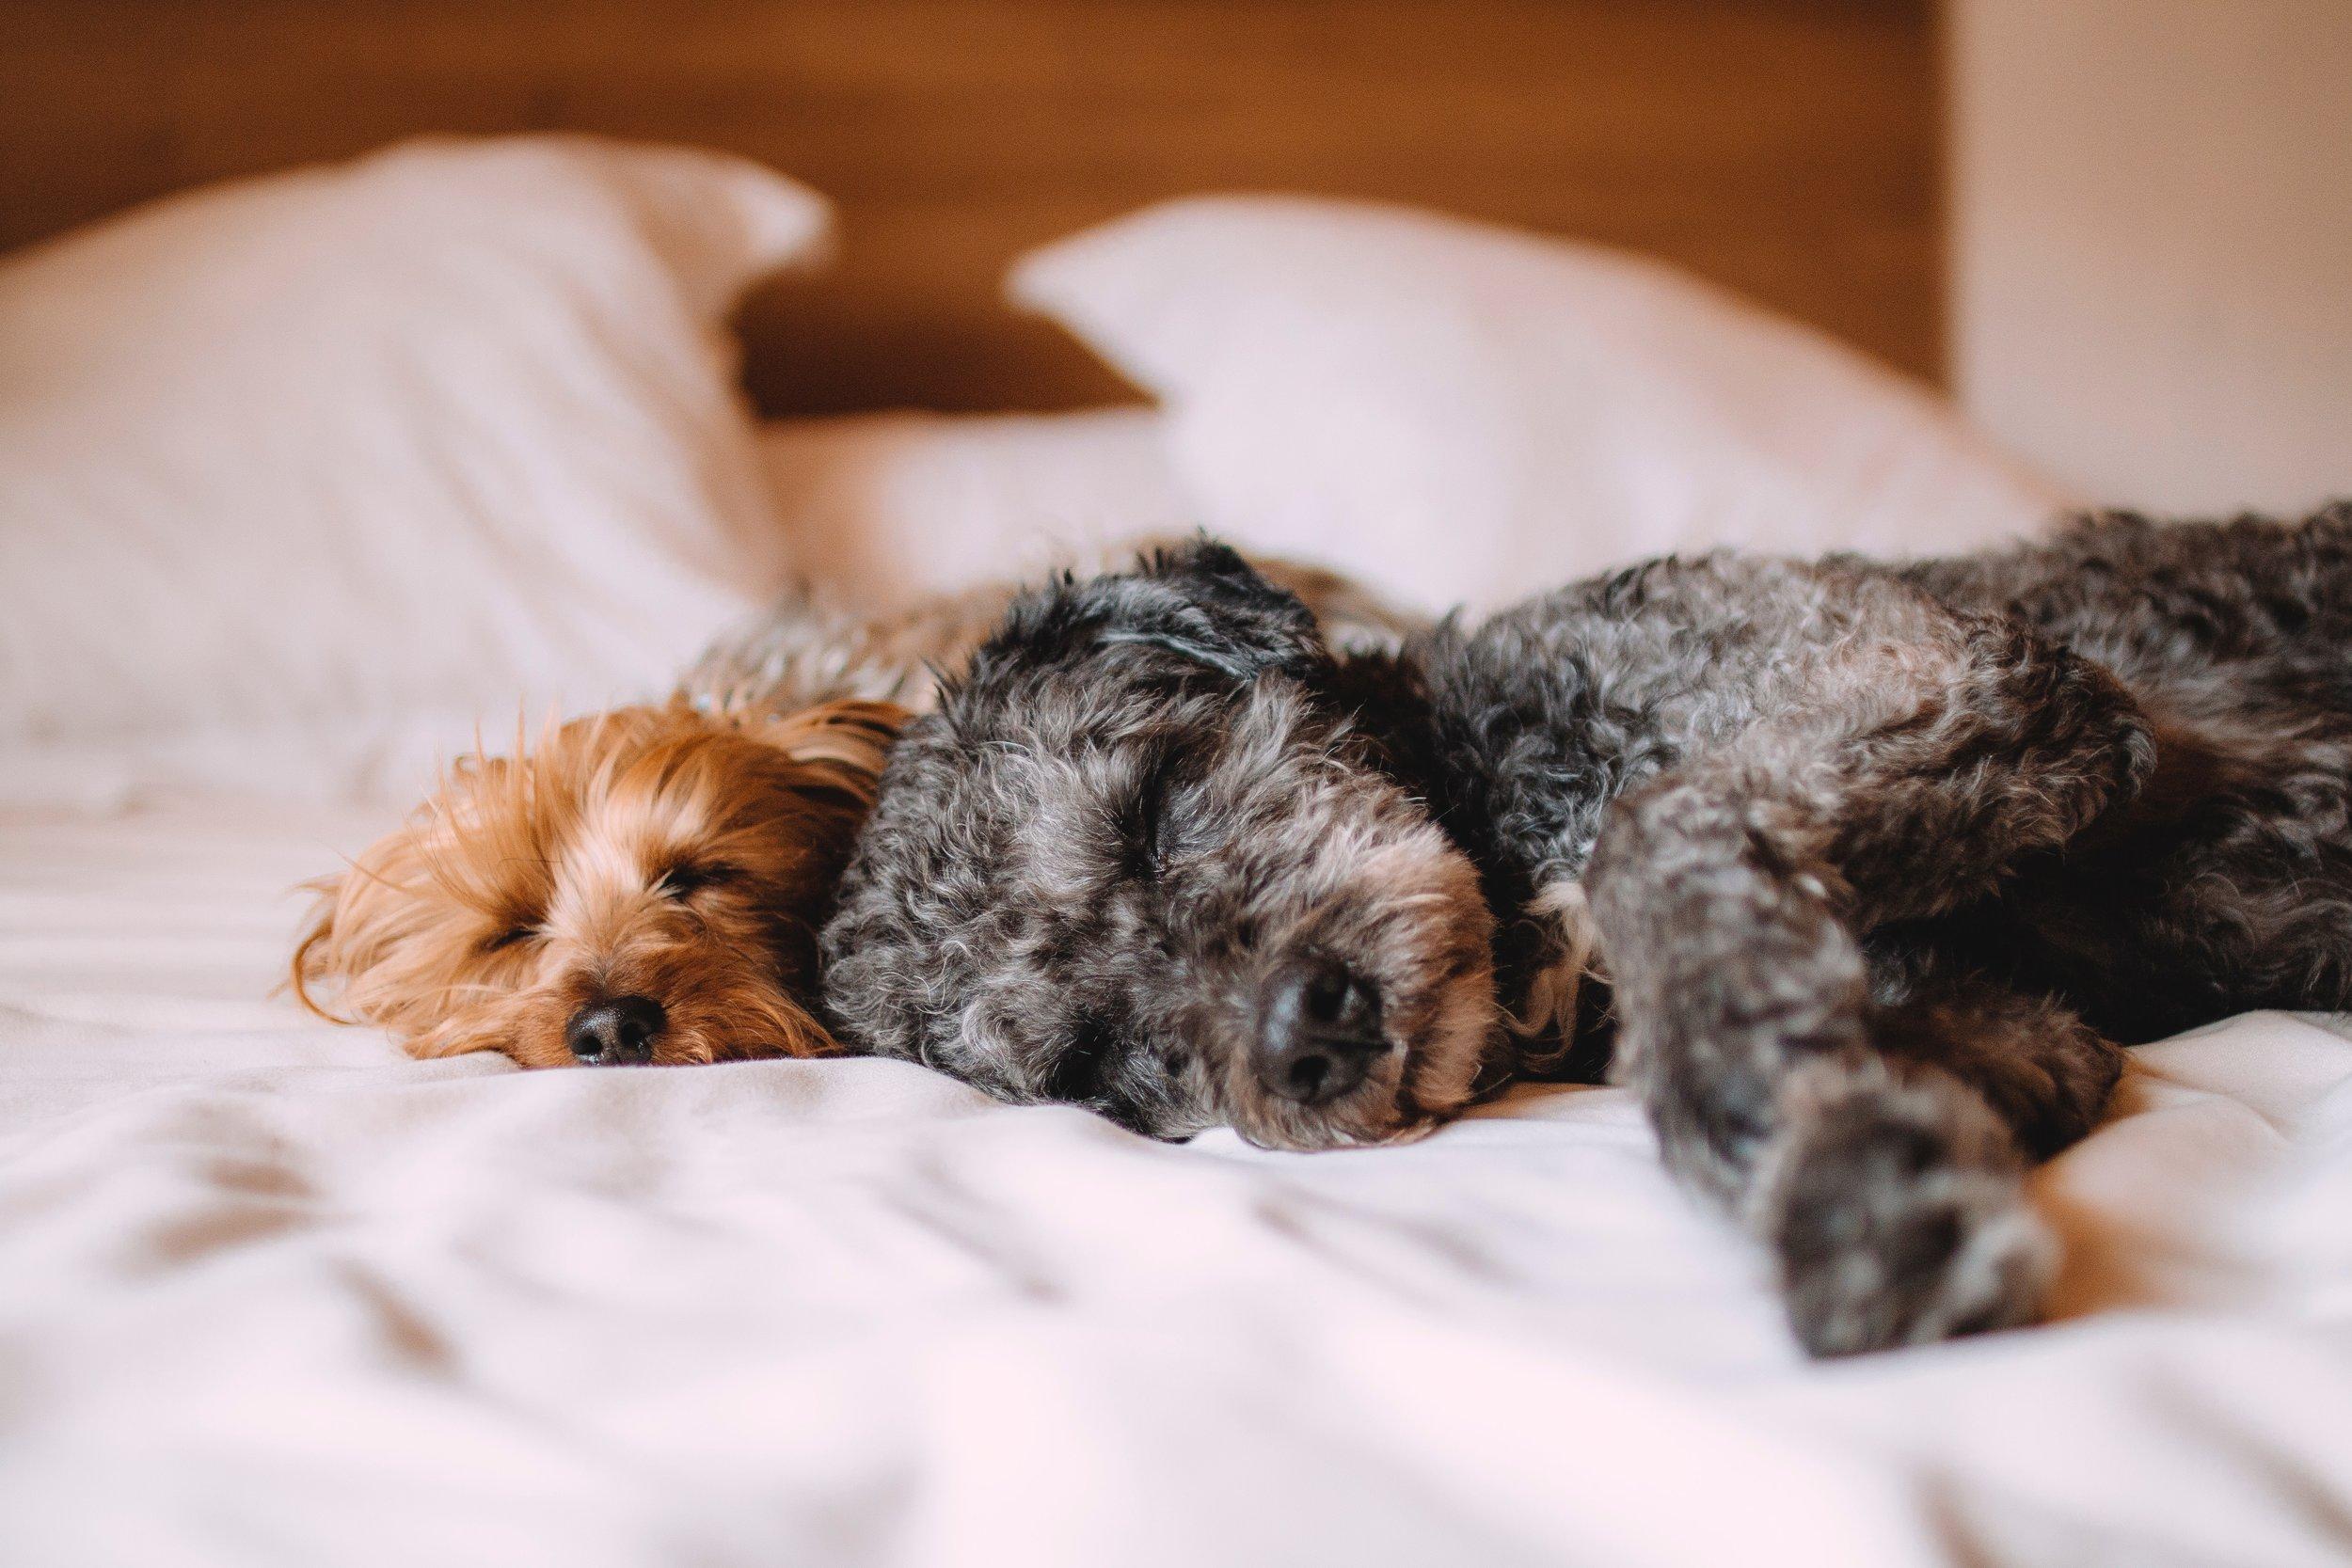 animals-bed-calm-57627.jpg